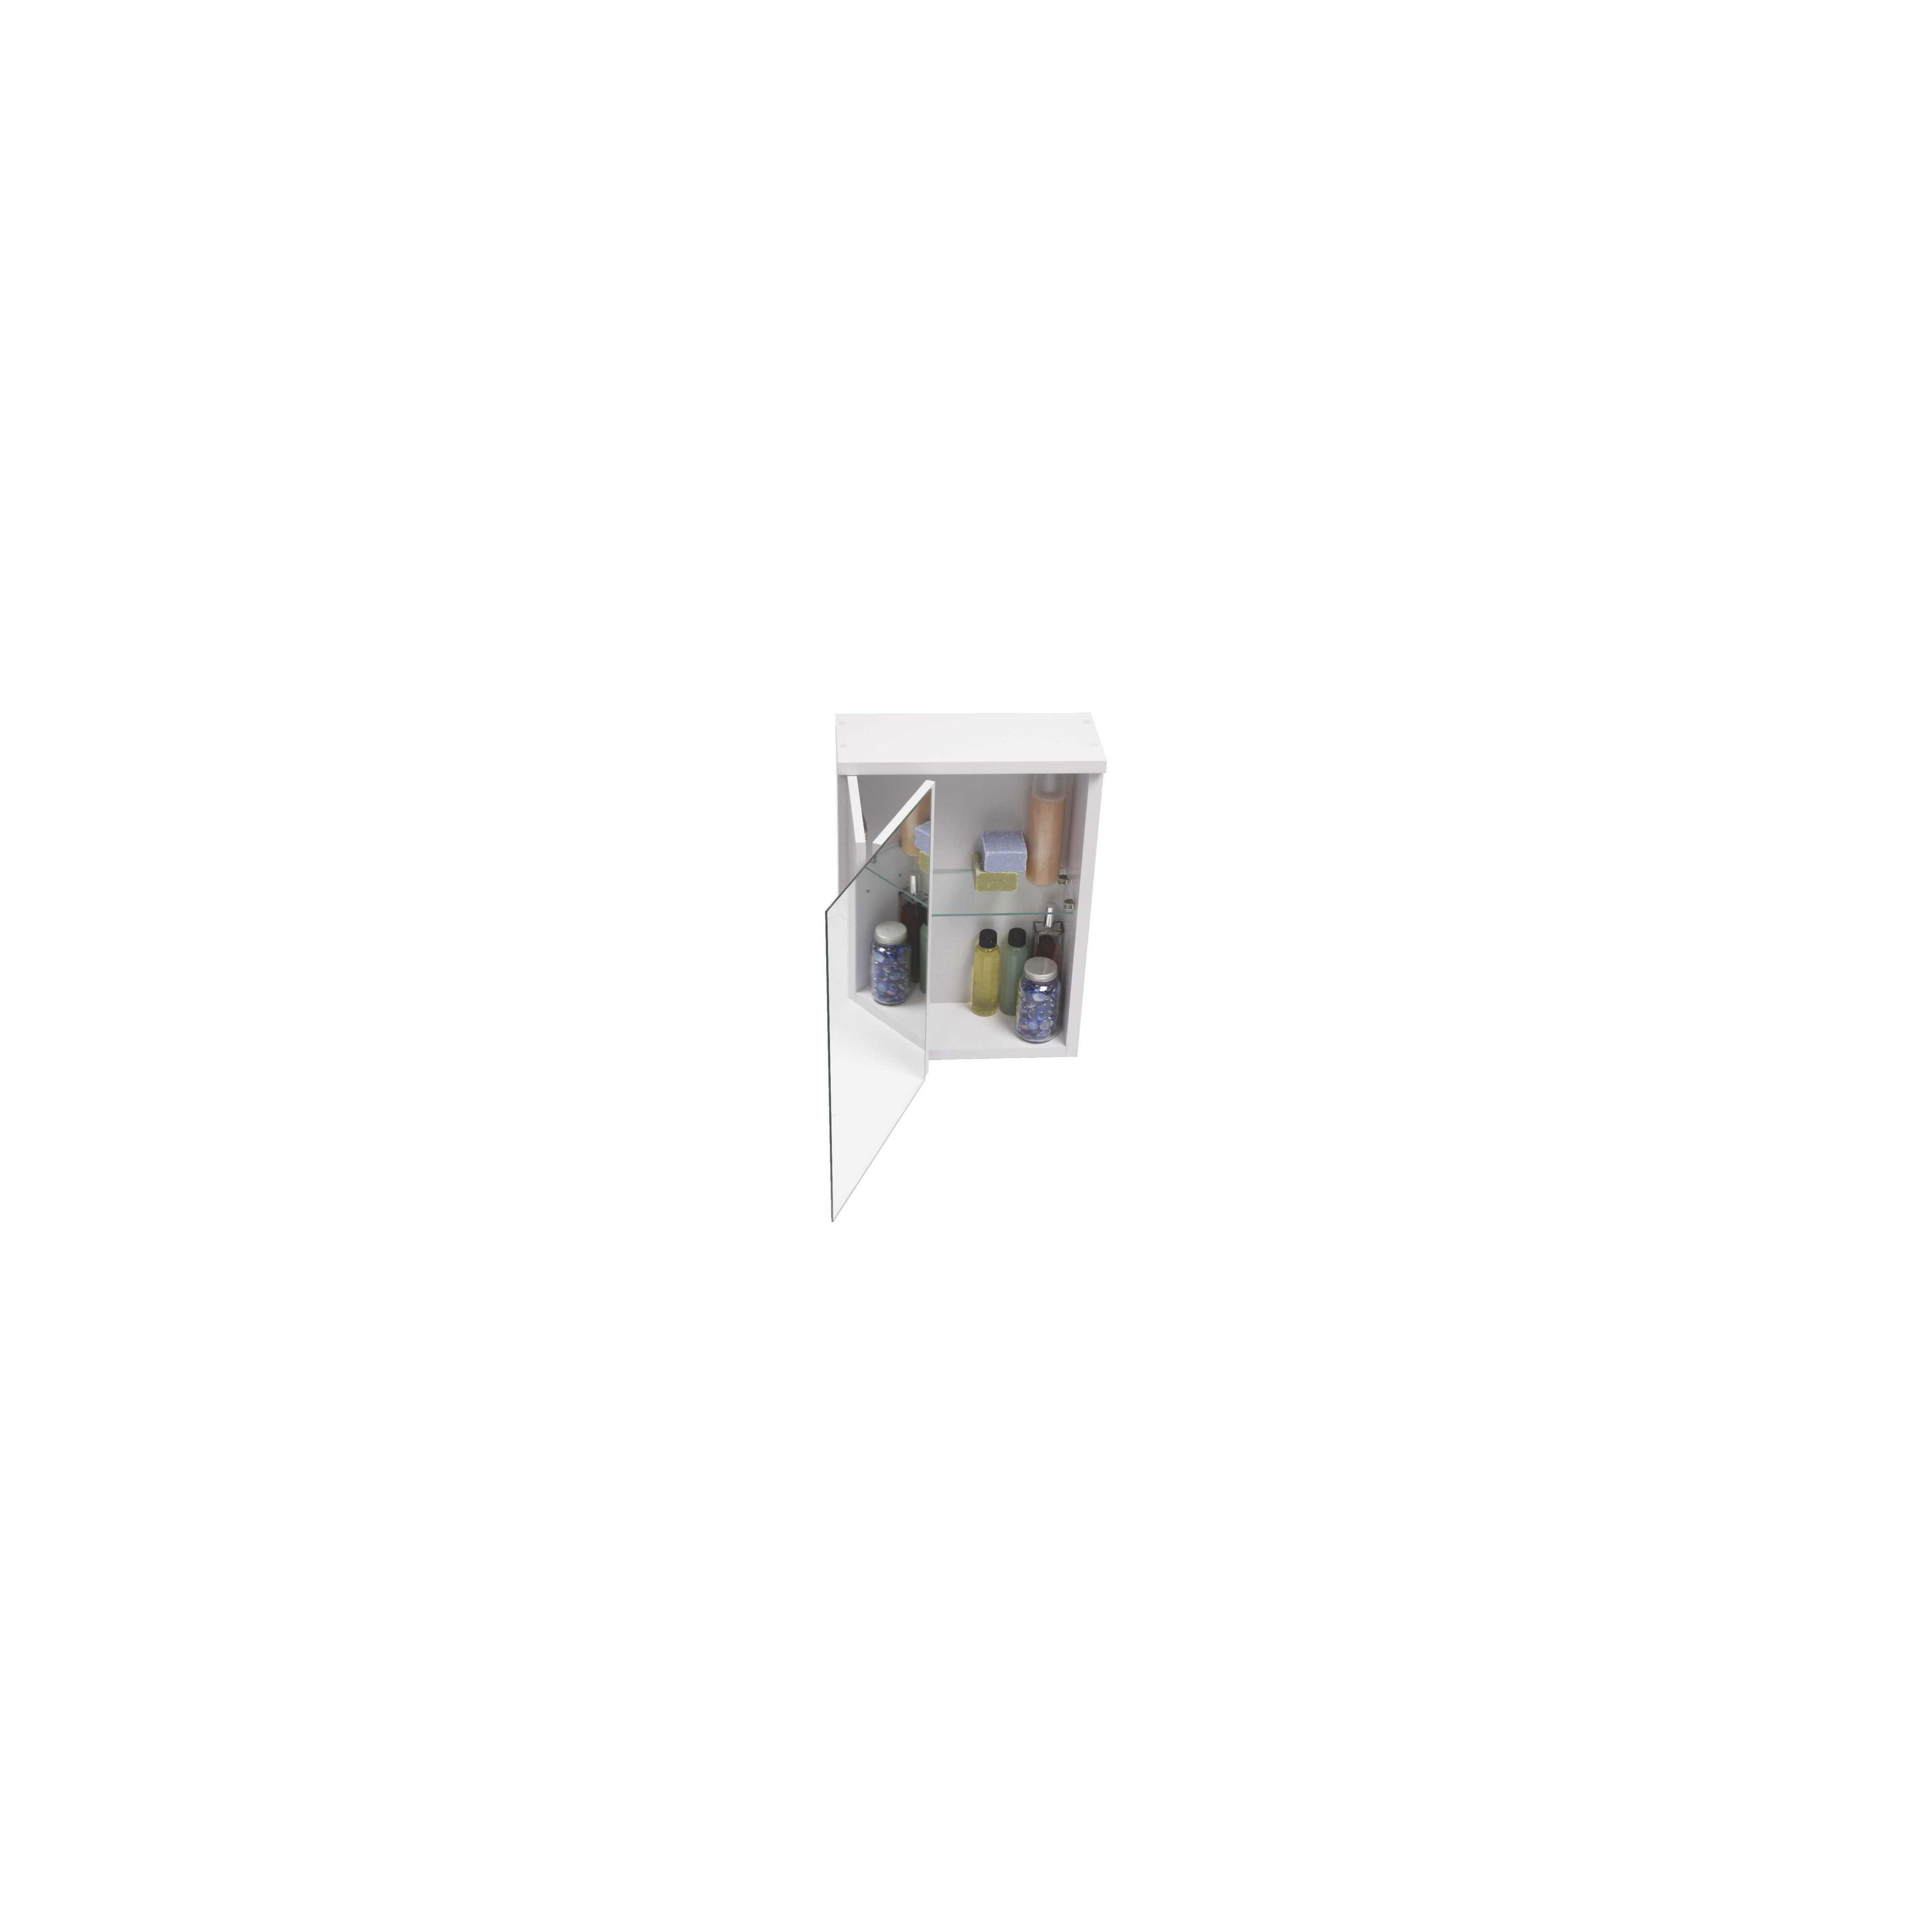 Croydex Montana Single Swivel Mirror Door Bathroom Cabinet - White